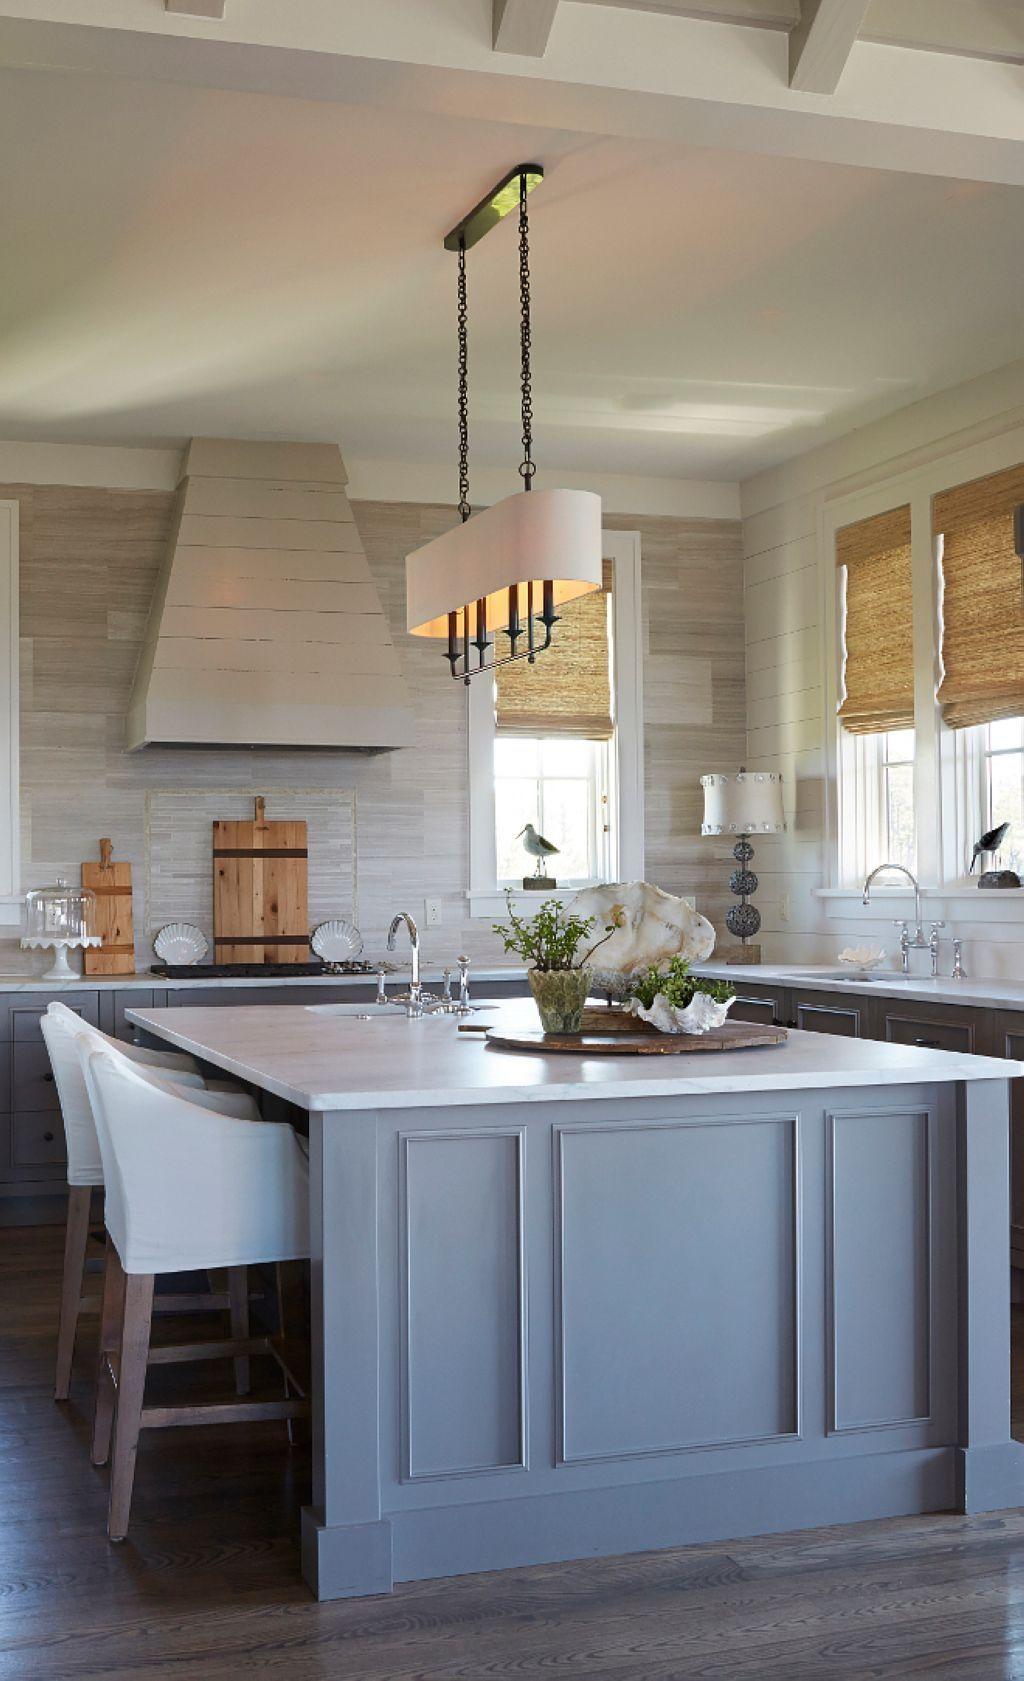 51 Beautiful Kitchen Ceiling Lighting Design Ideas